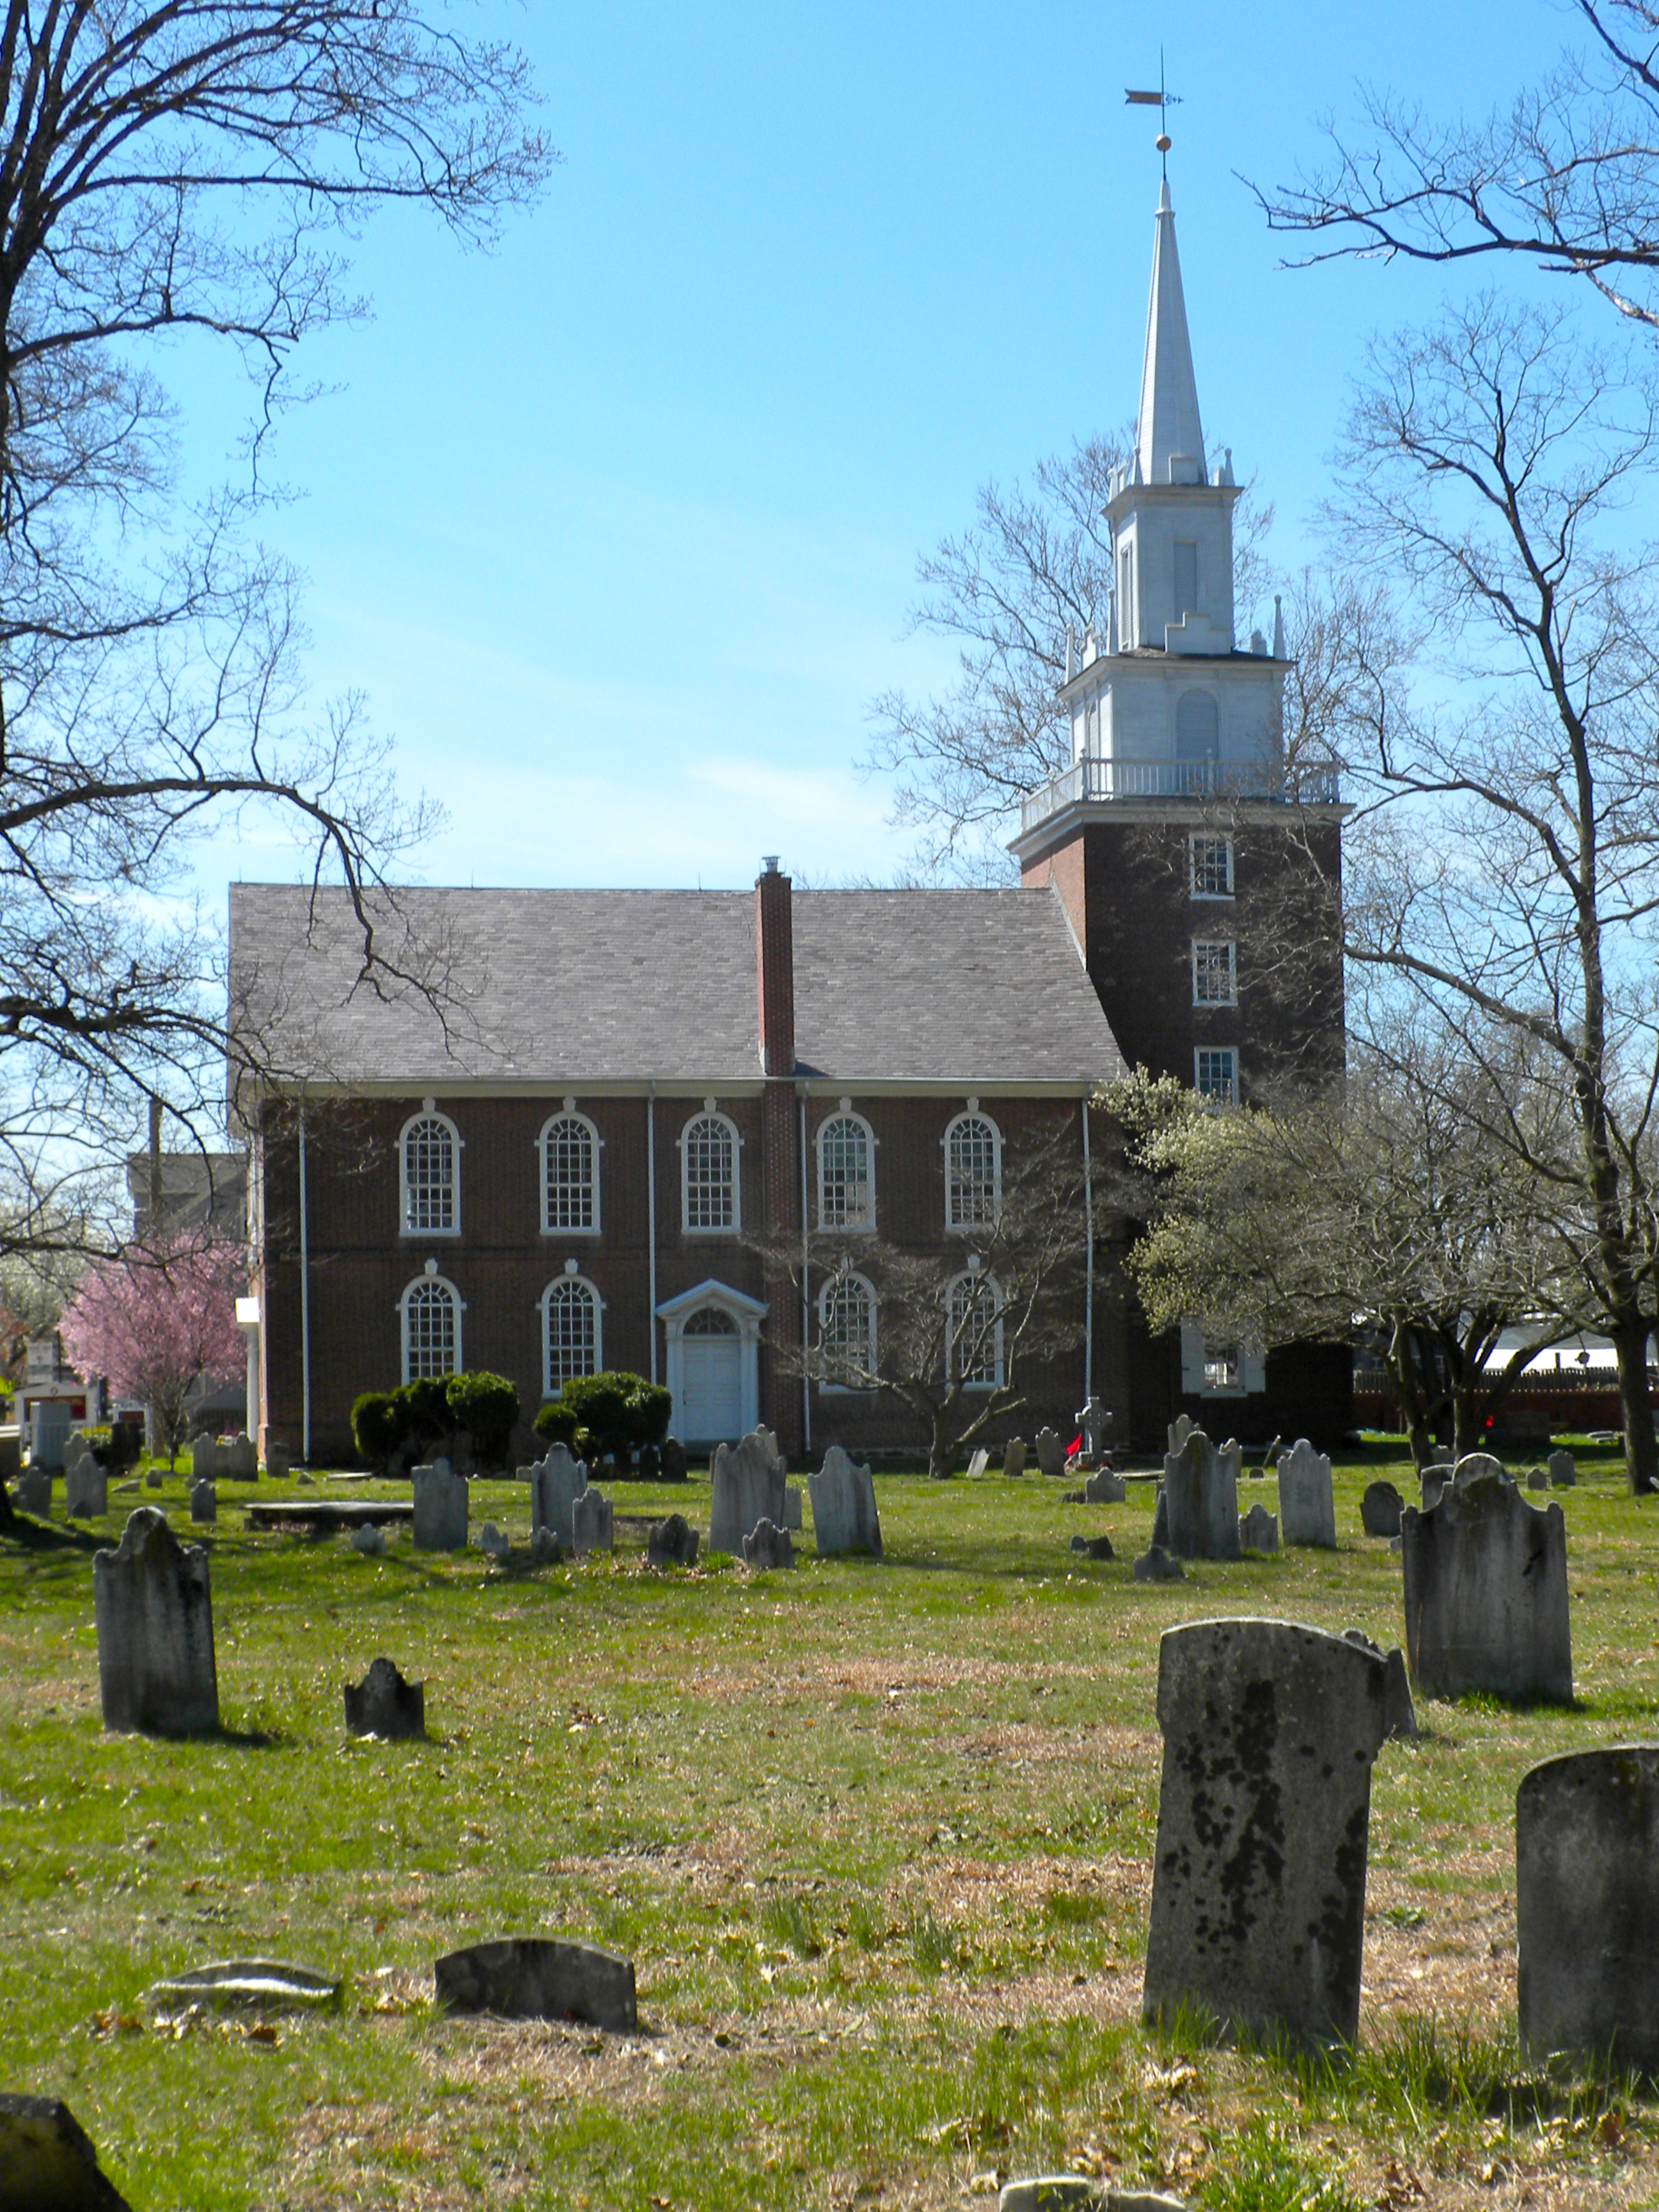 OLD SWEDES INN (now Tavro13) - History & Genealogy of Gloucester Co NJ